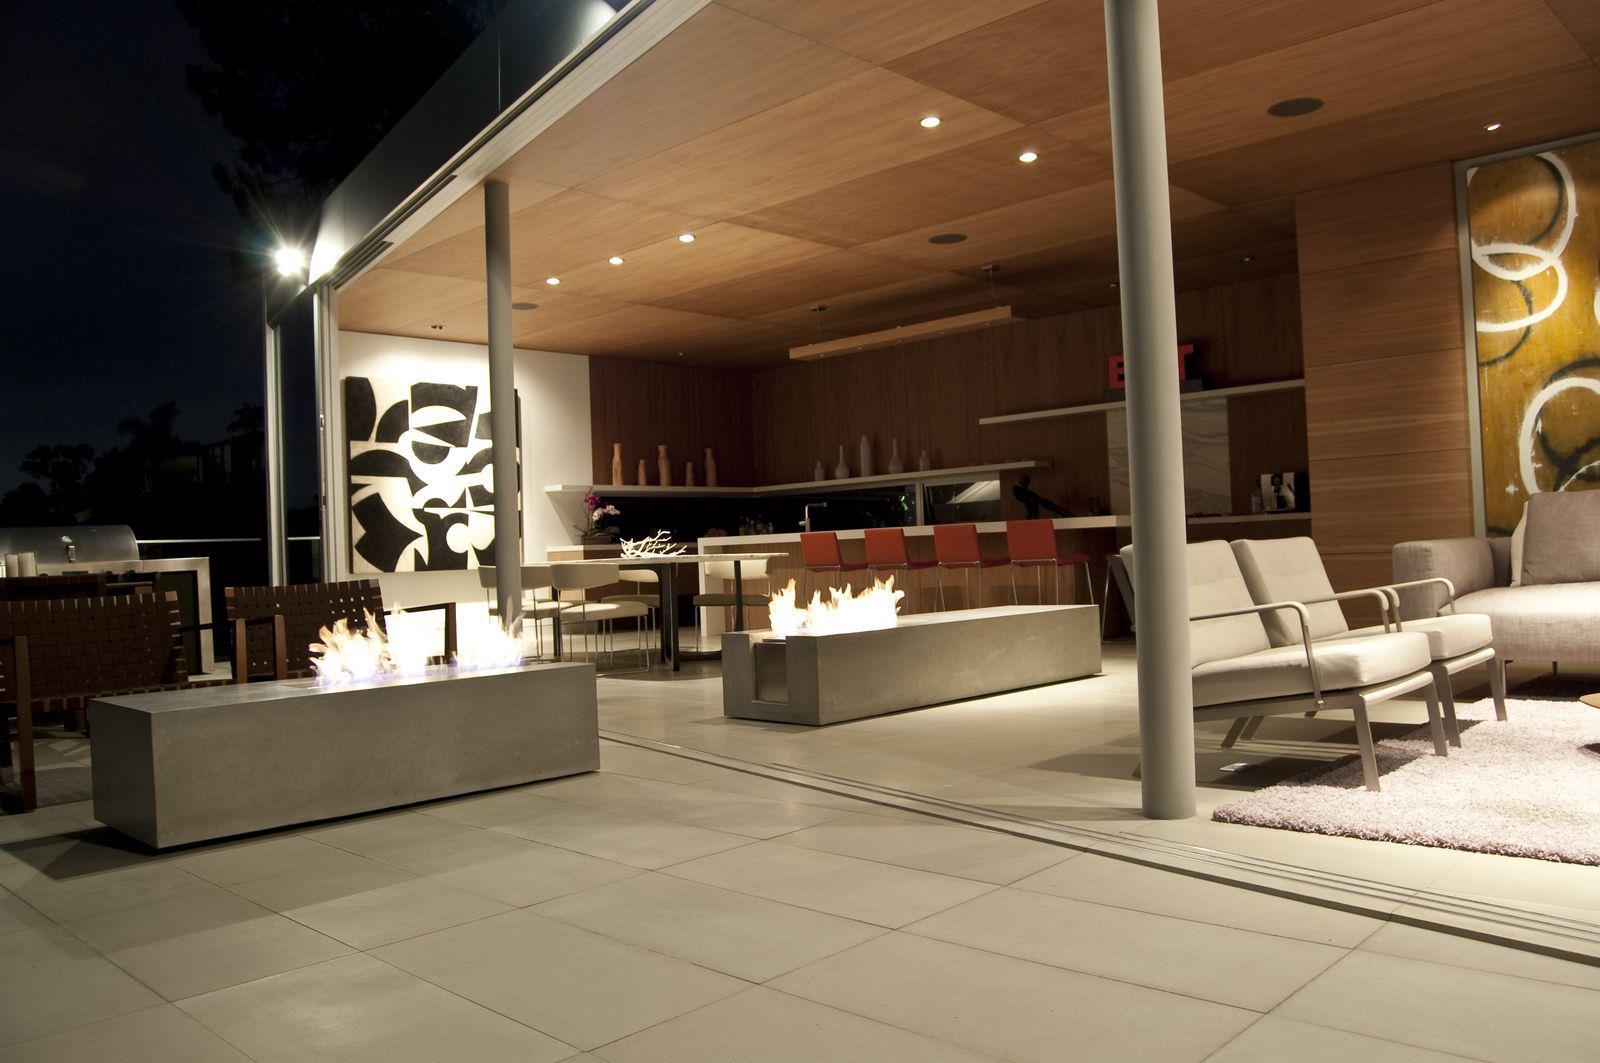 ecosmart fire xl900. Black Bedroom Furniture Sets. Home Design Ideas